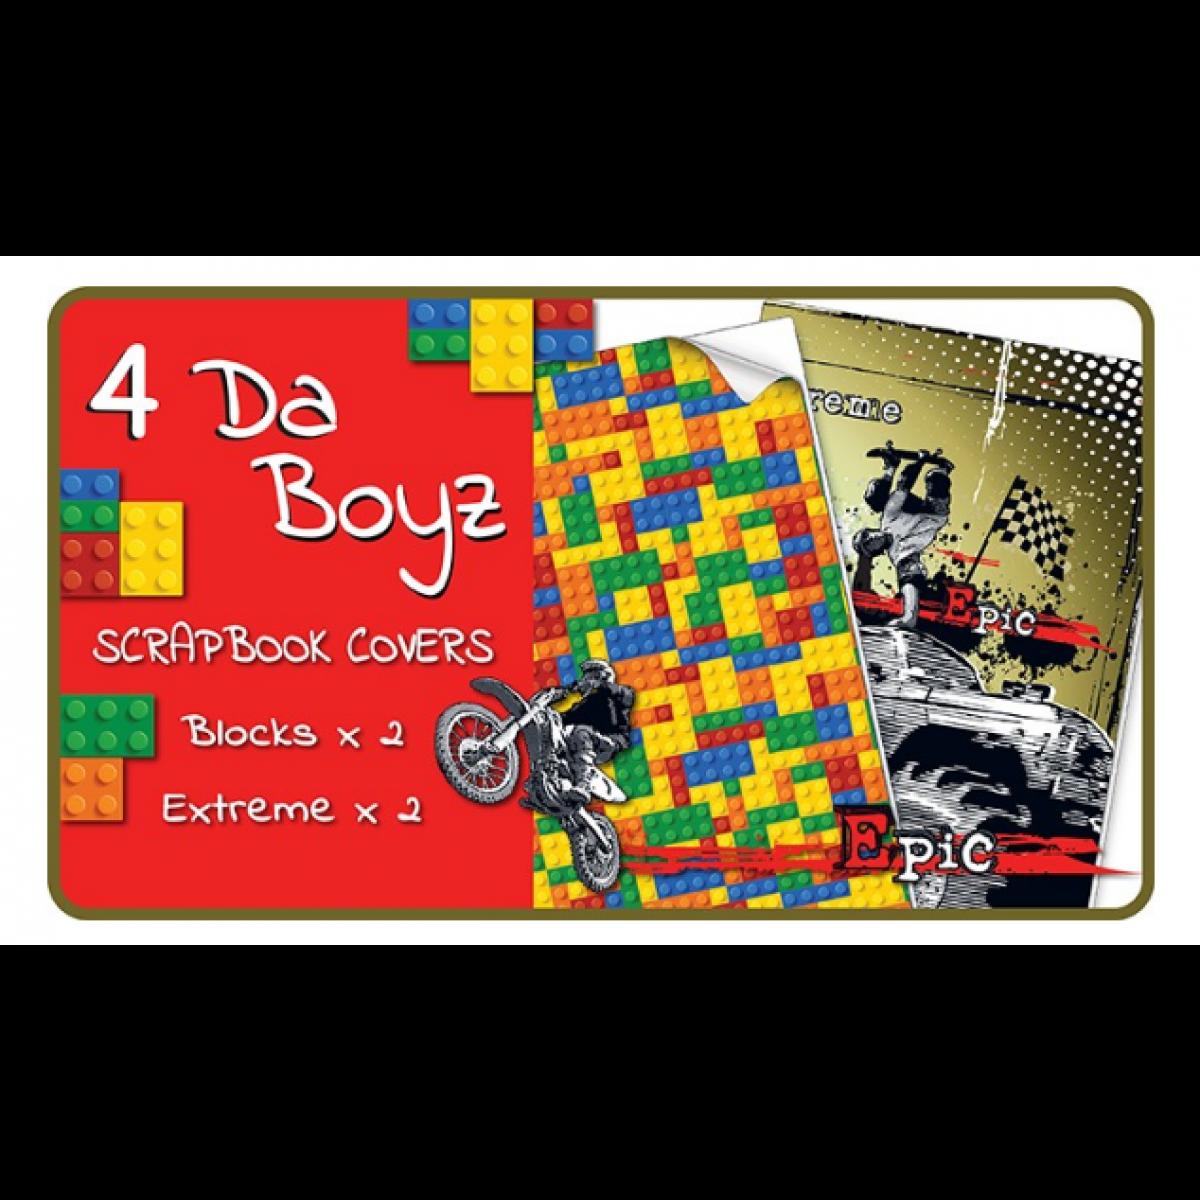 2kool4skool 4 Da Boyz Scrapbook Covers The School Locker